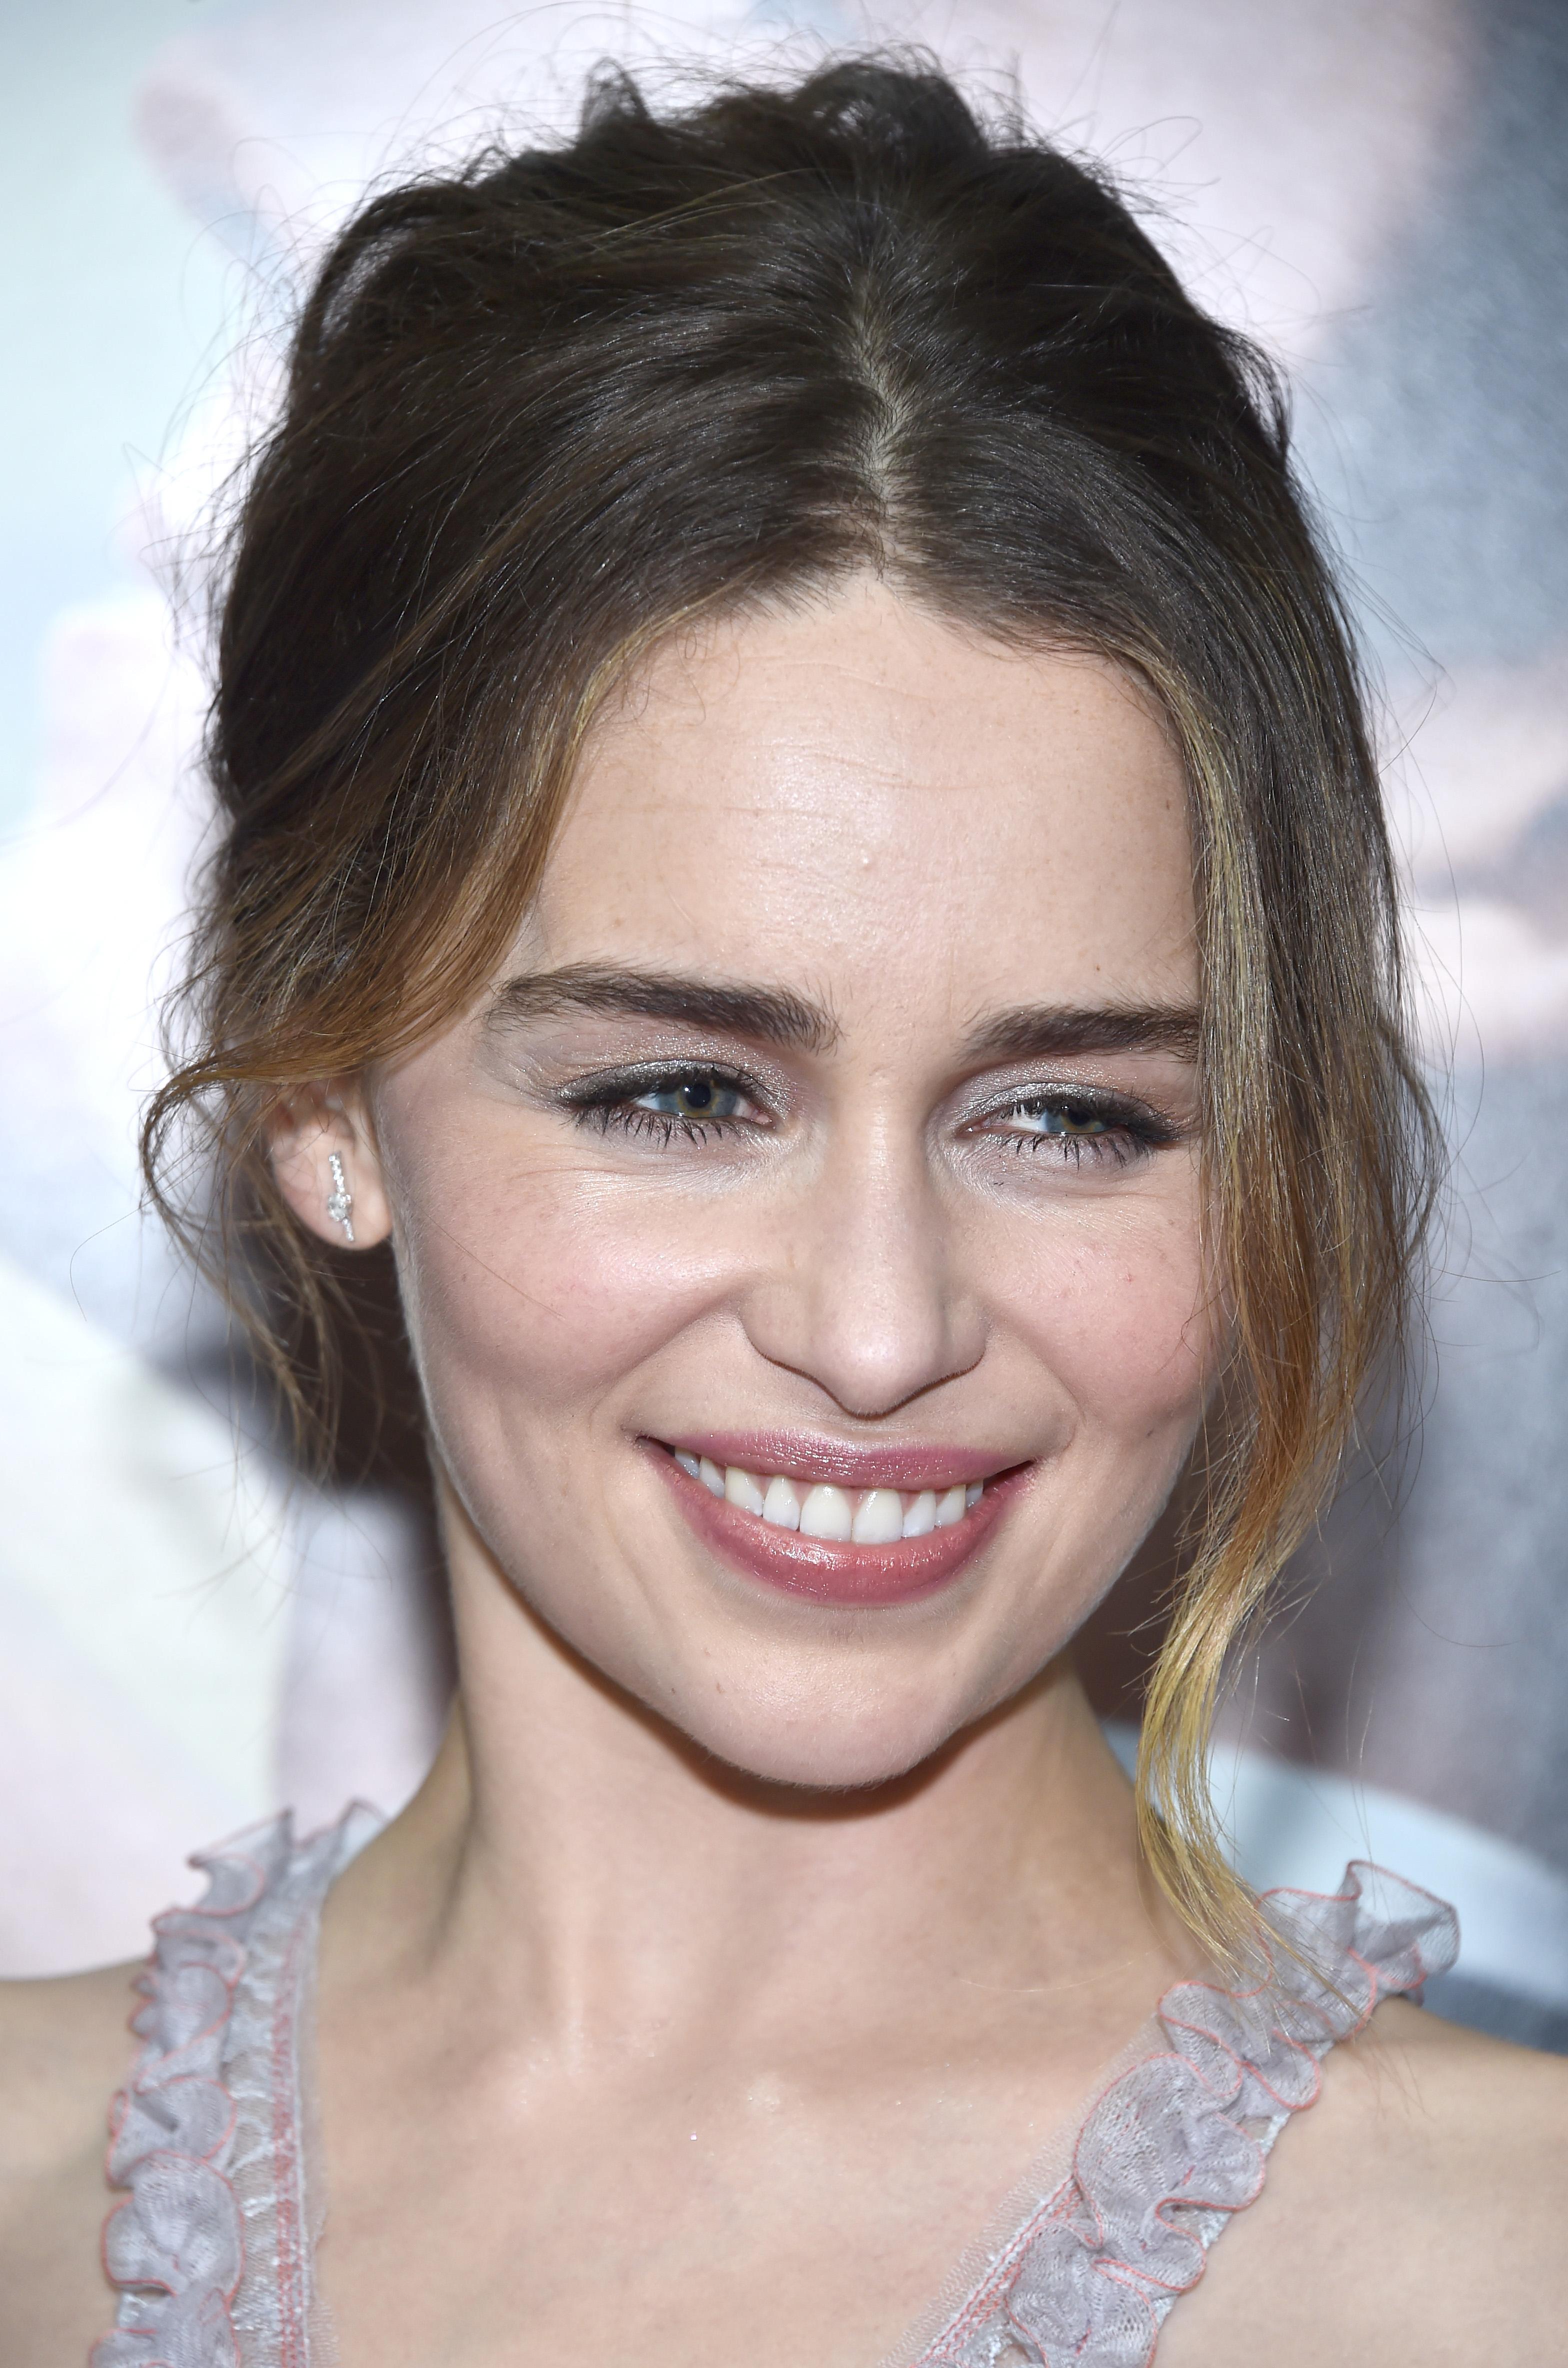 Snapchat Emilia Clarke nude photos 2019